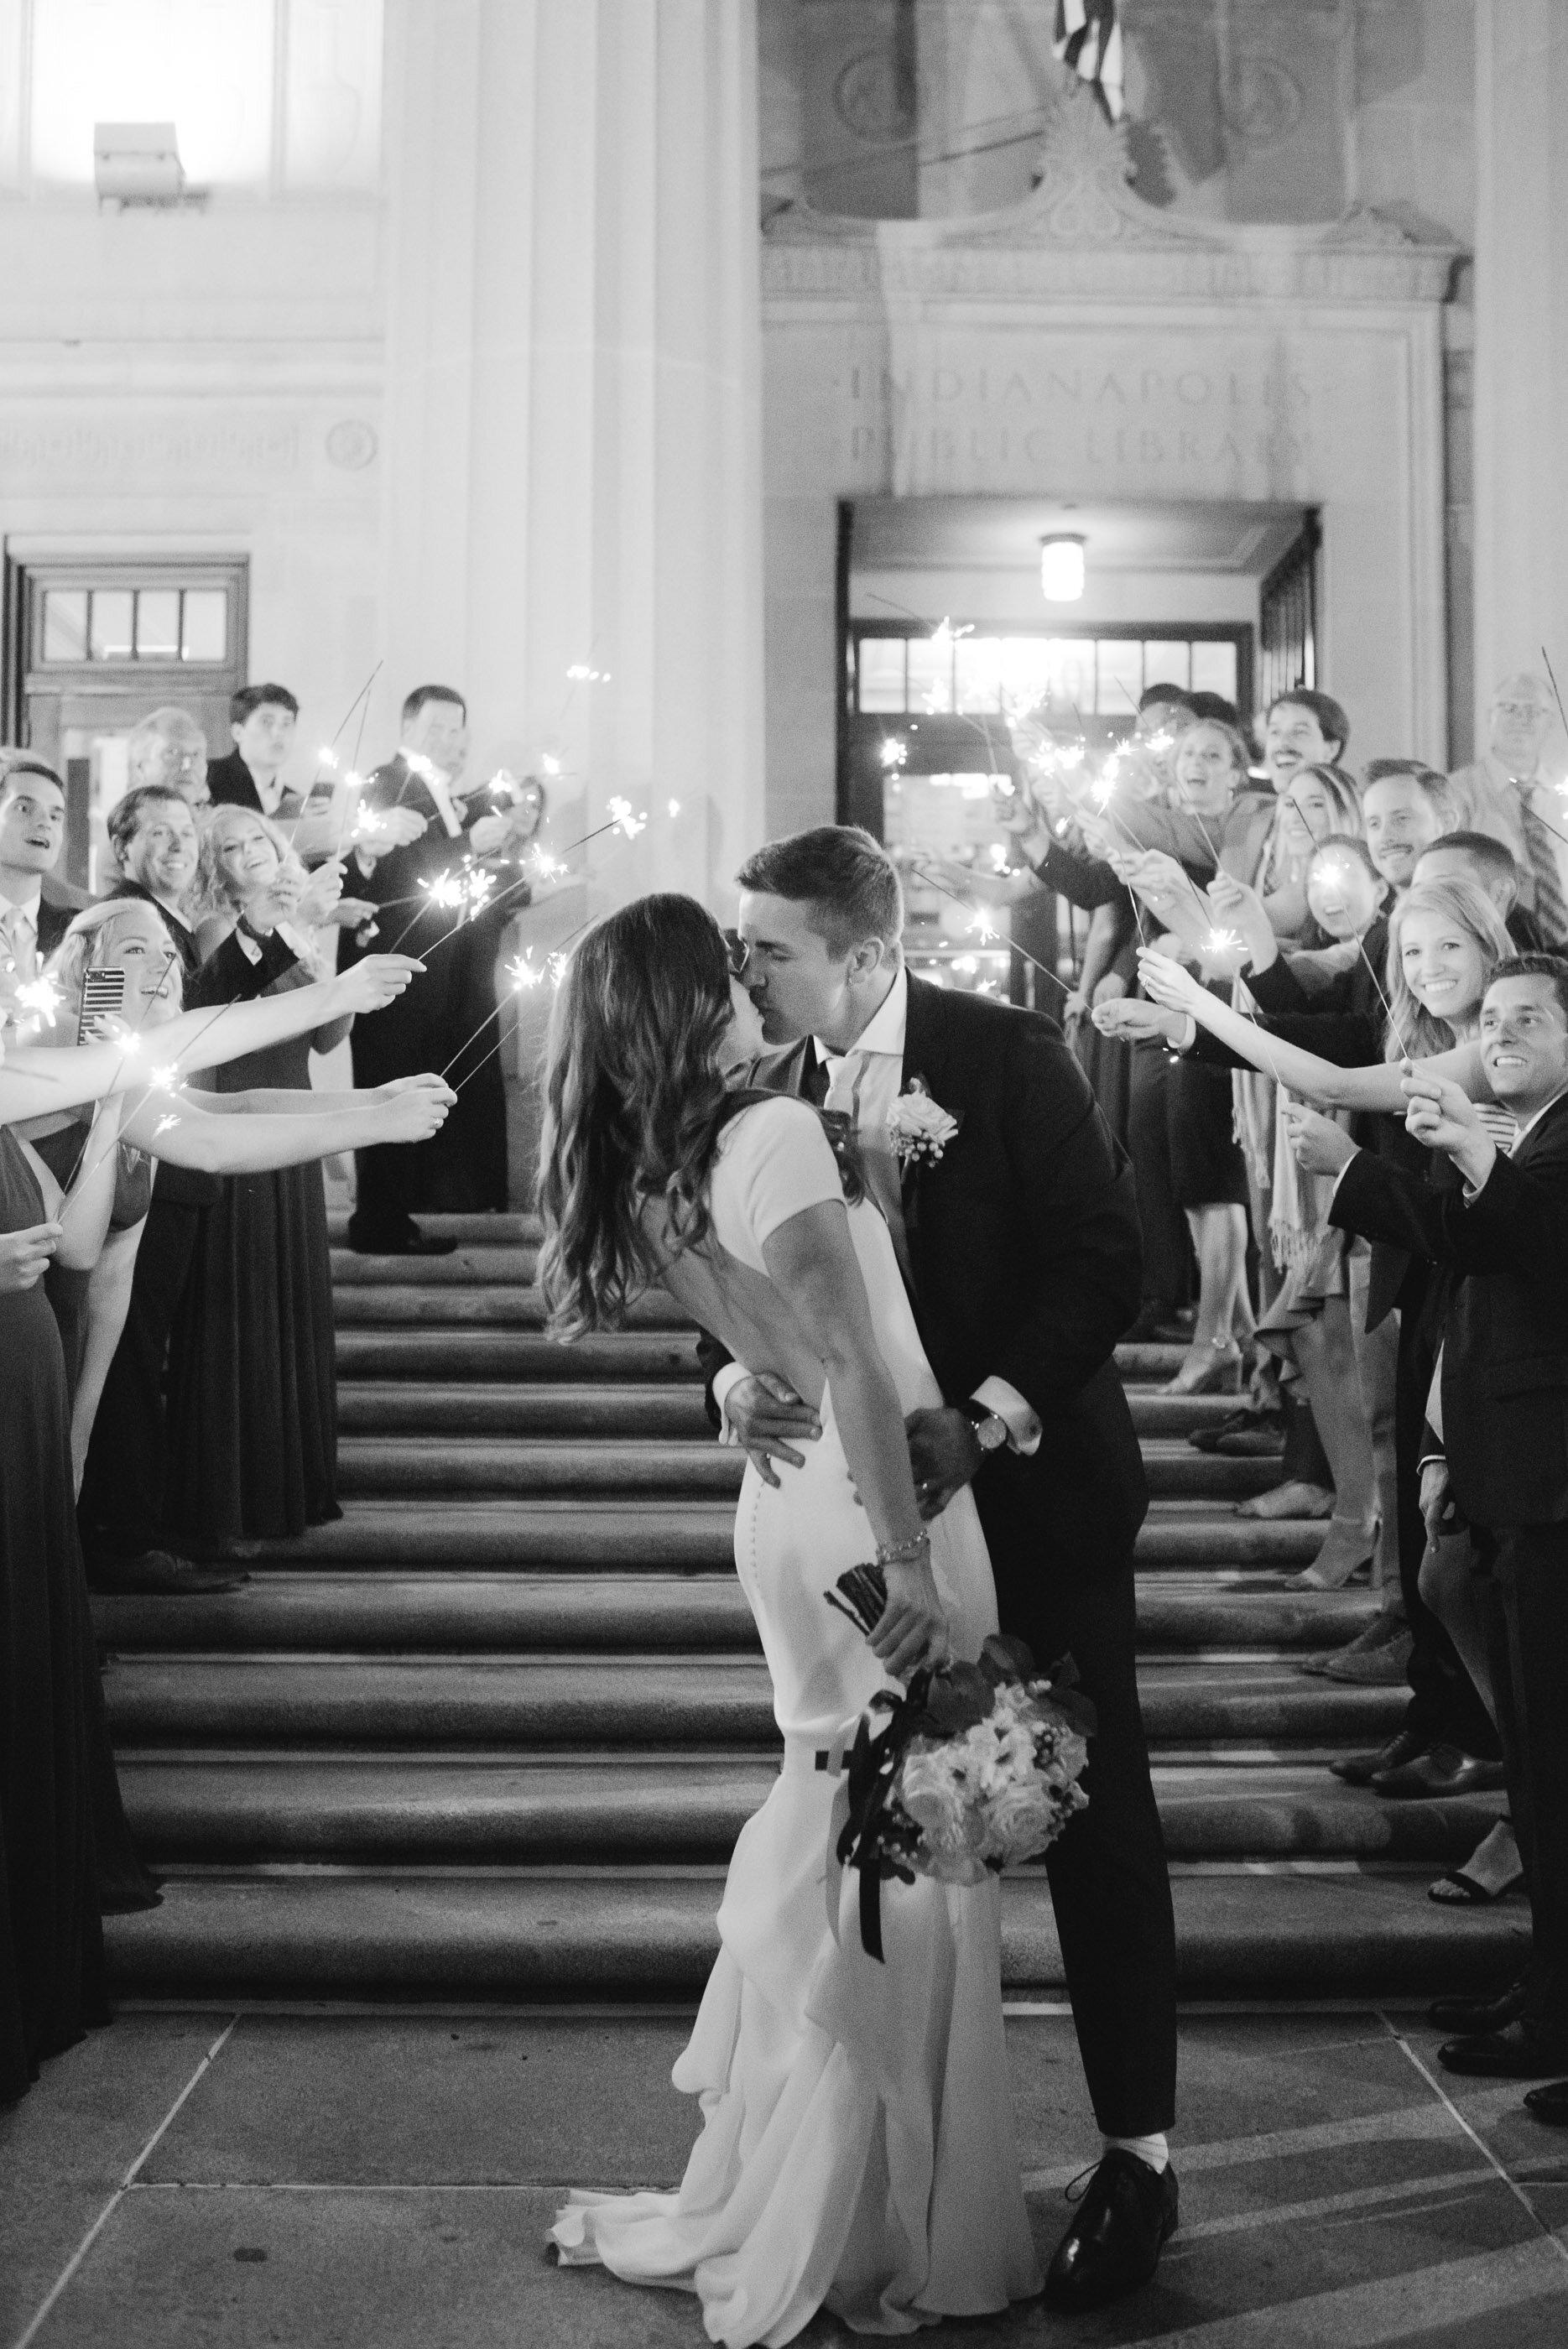 Indianapolis Central Library Wedding Erika Aileen Photography Indianapolis Wedding Photographer